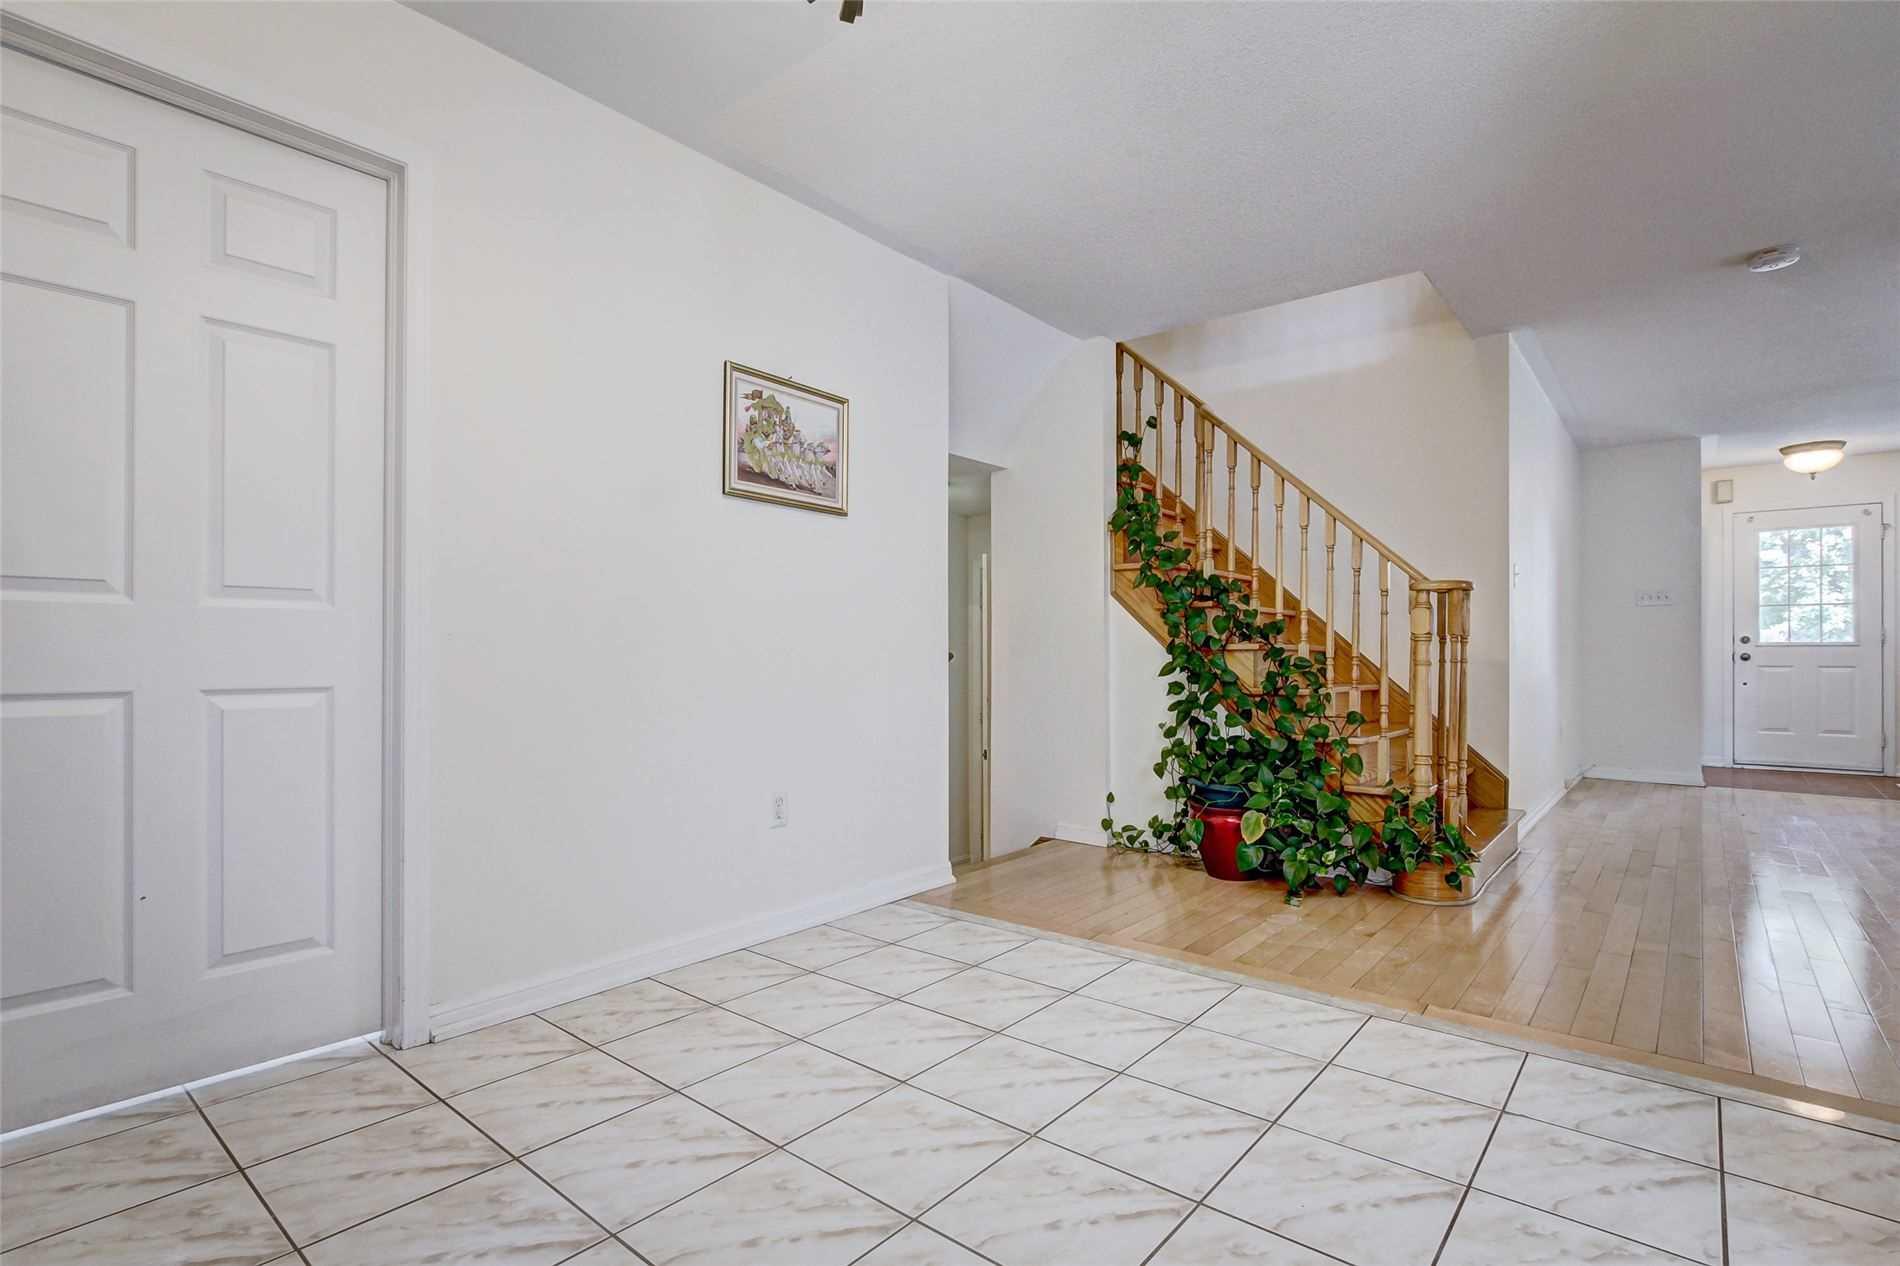 1589 Sarasota Cres, Oshawa E4552736